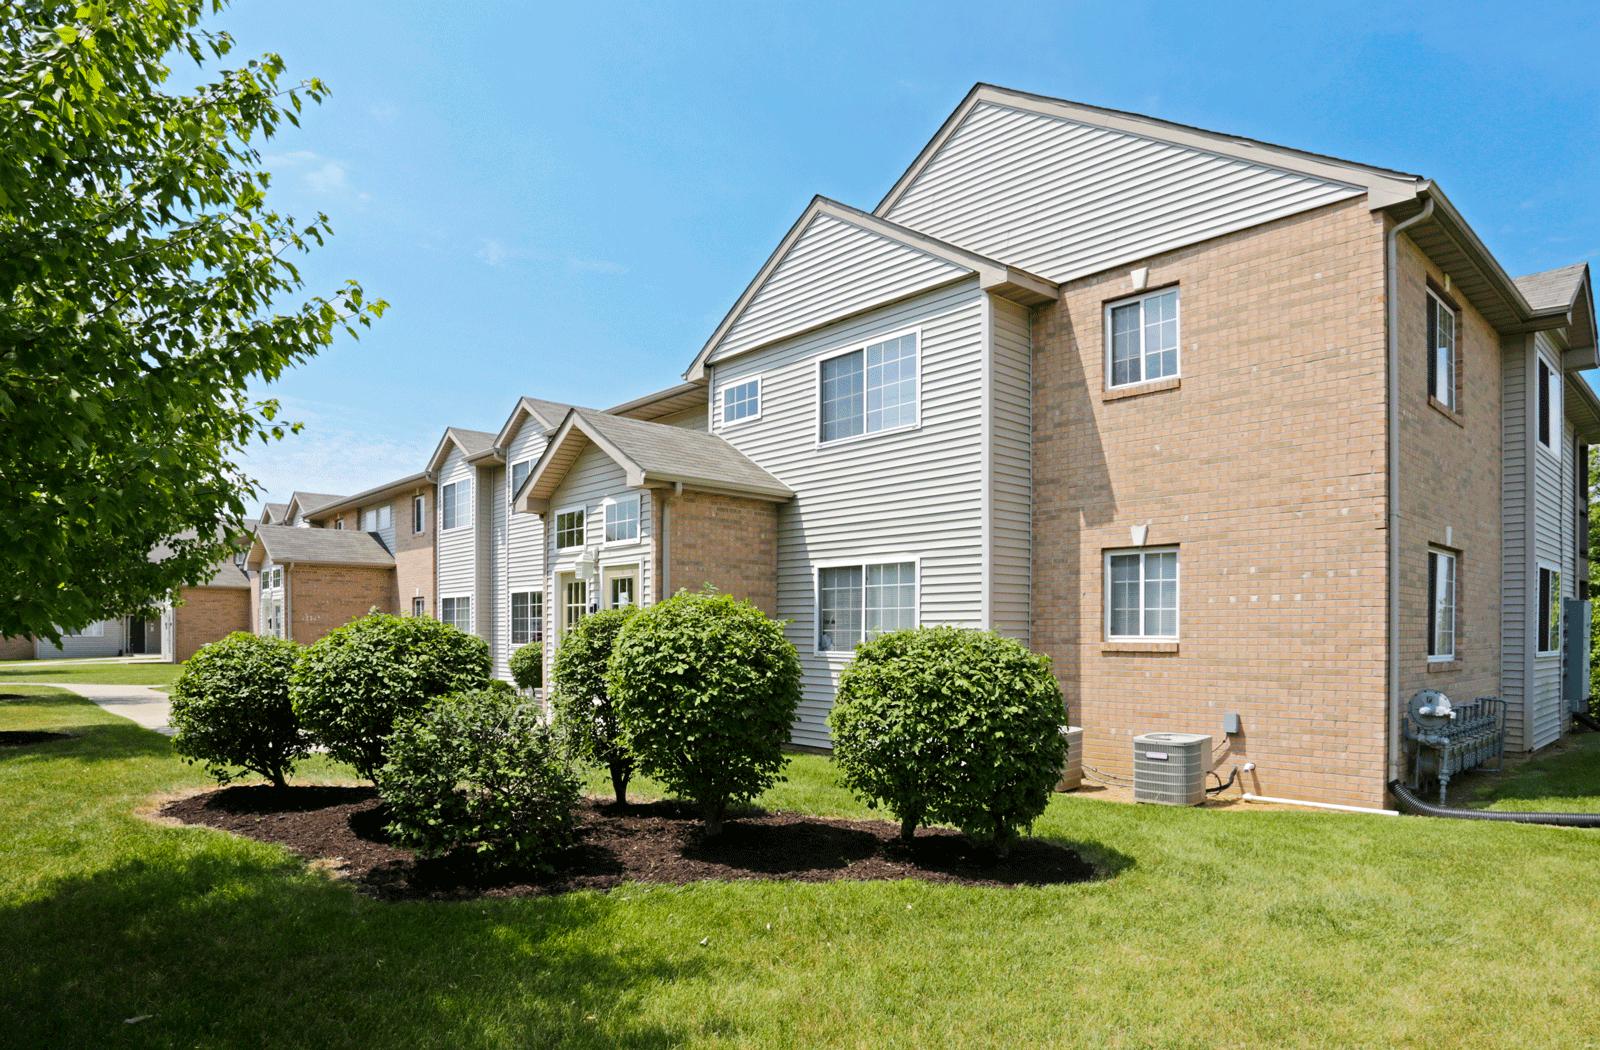 Knoxville Pointe Apartments Dunlap Il